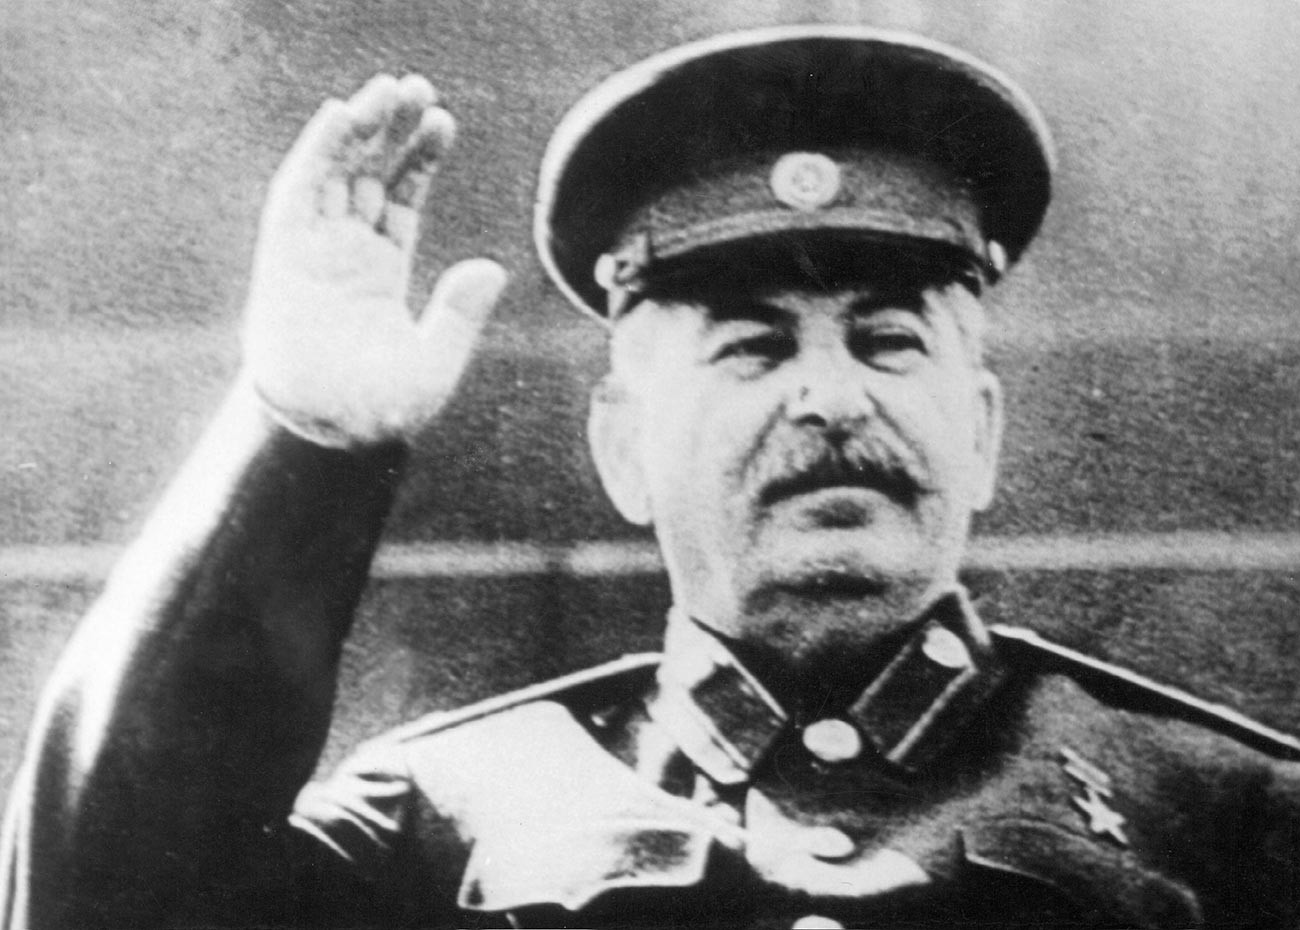 Iôssif Stálin na tribuna do Mausoléu de Lênin, Moscou.